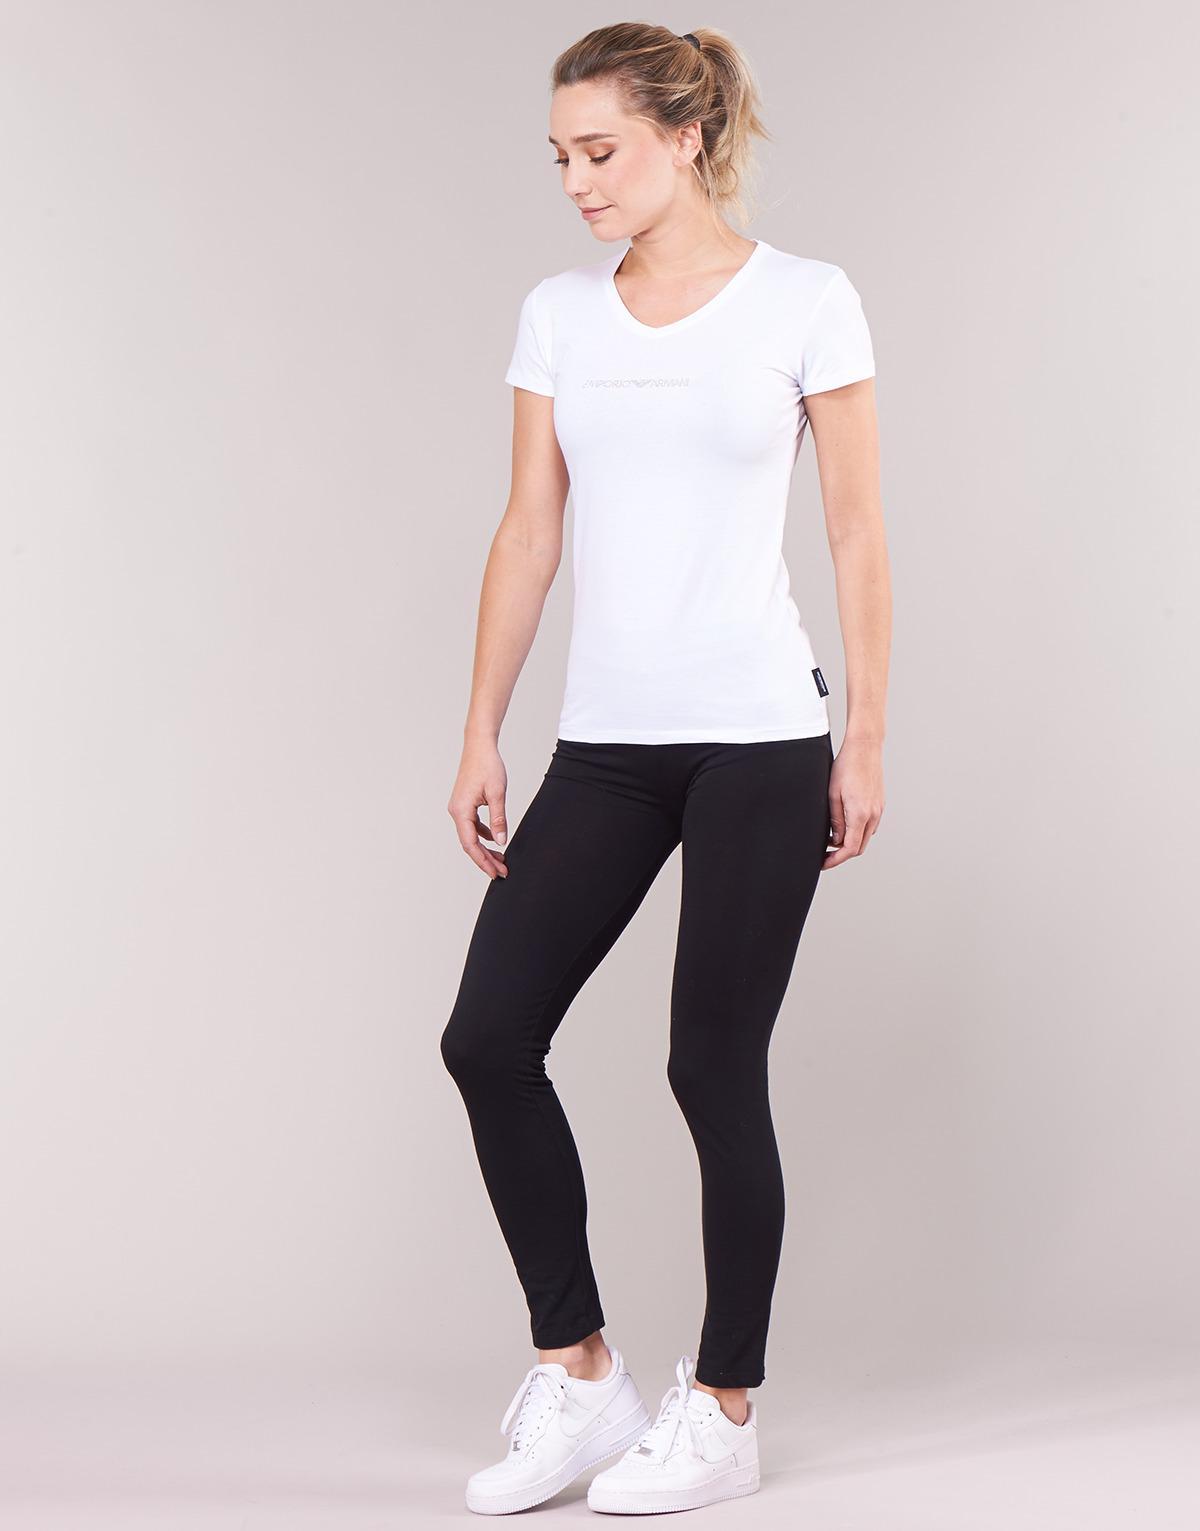 fa5a17146748 Emporio Armani - Cc317-163321-00010 Women's T Shirt In White - Lyst. View  fullscreen